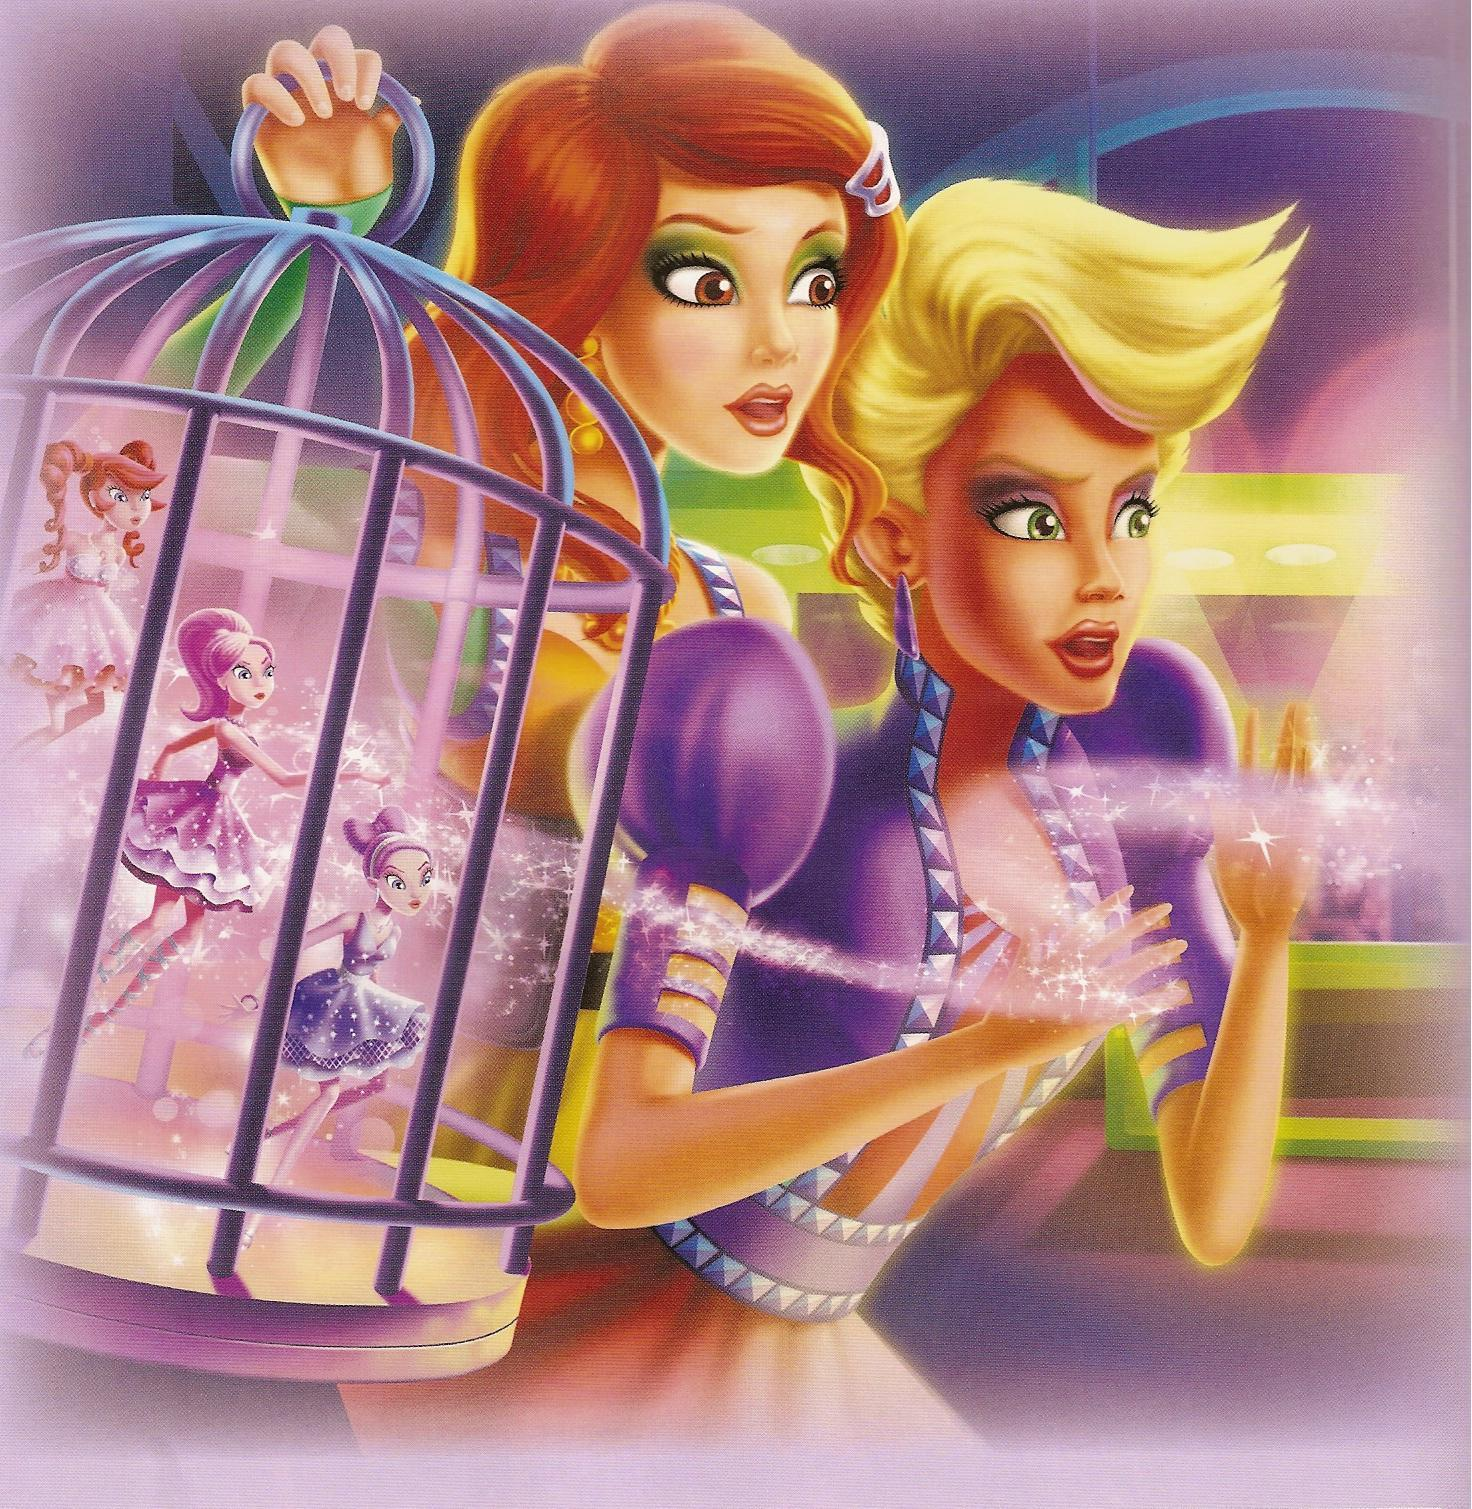 Image Barbie A Fashion Fairytale Book Scan Barbie Movies Wiki 39 39 The Wiki Dedicated